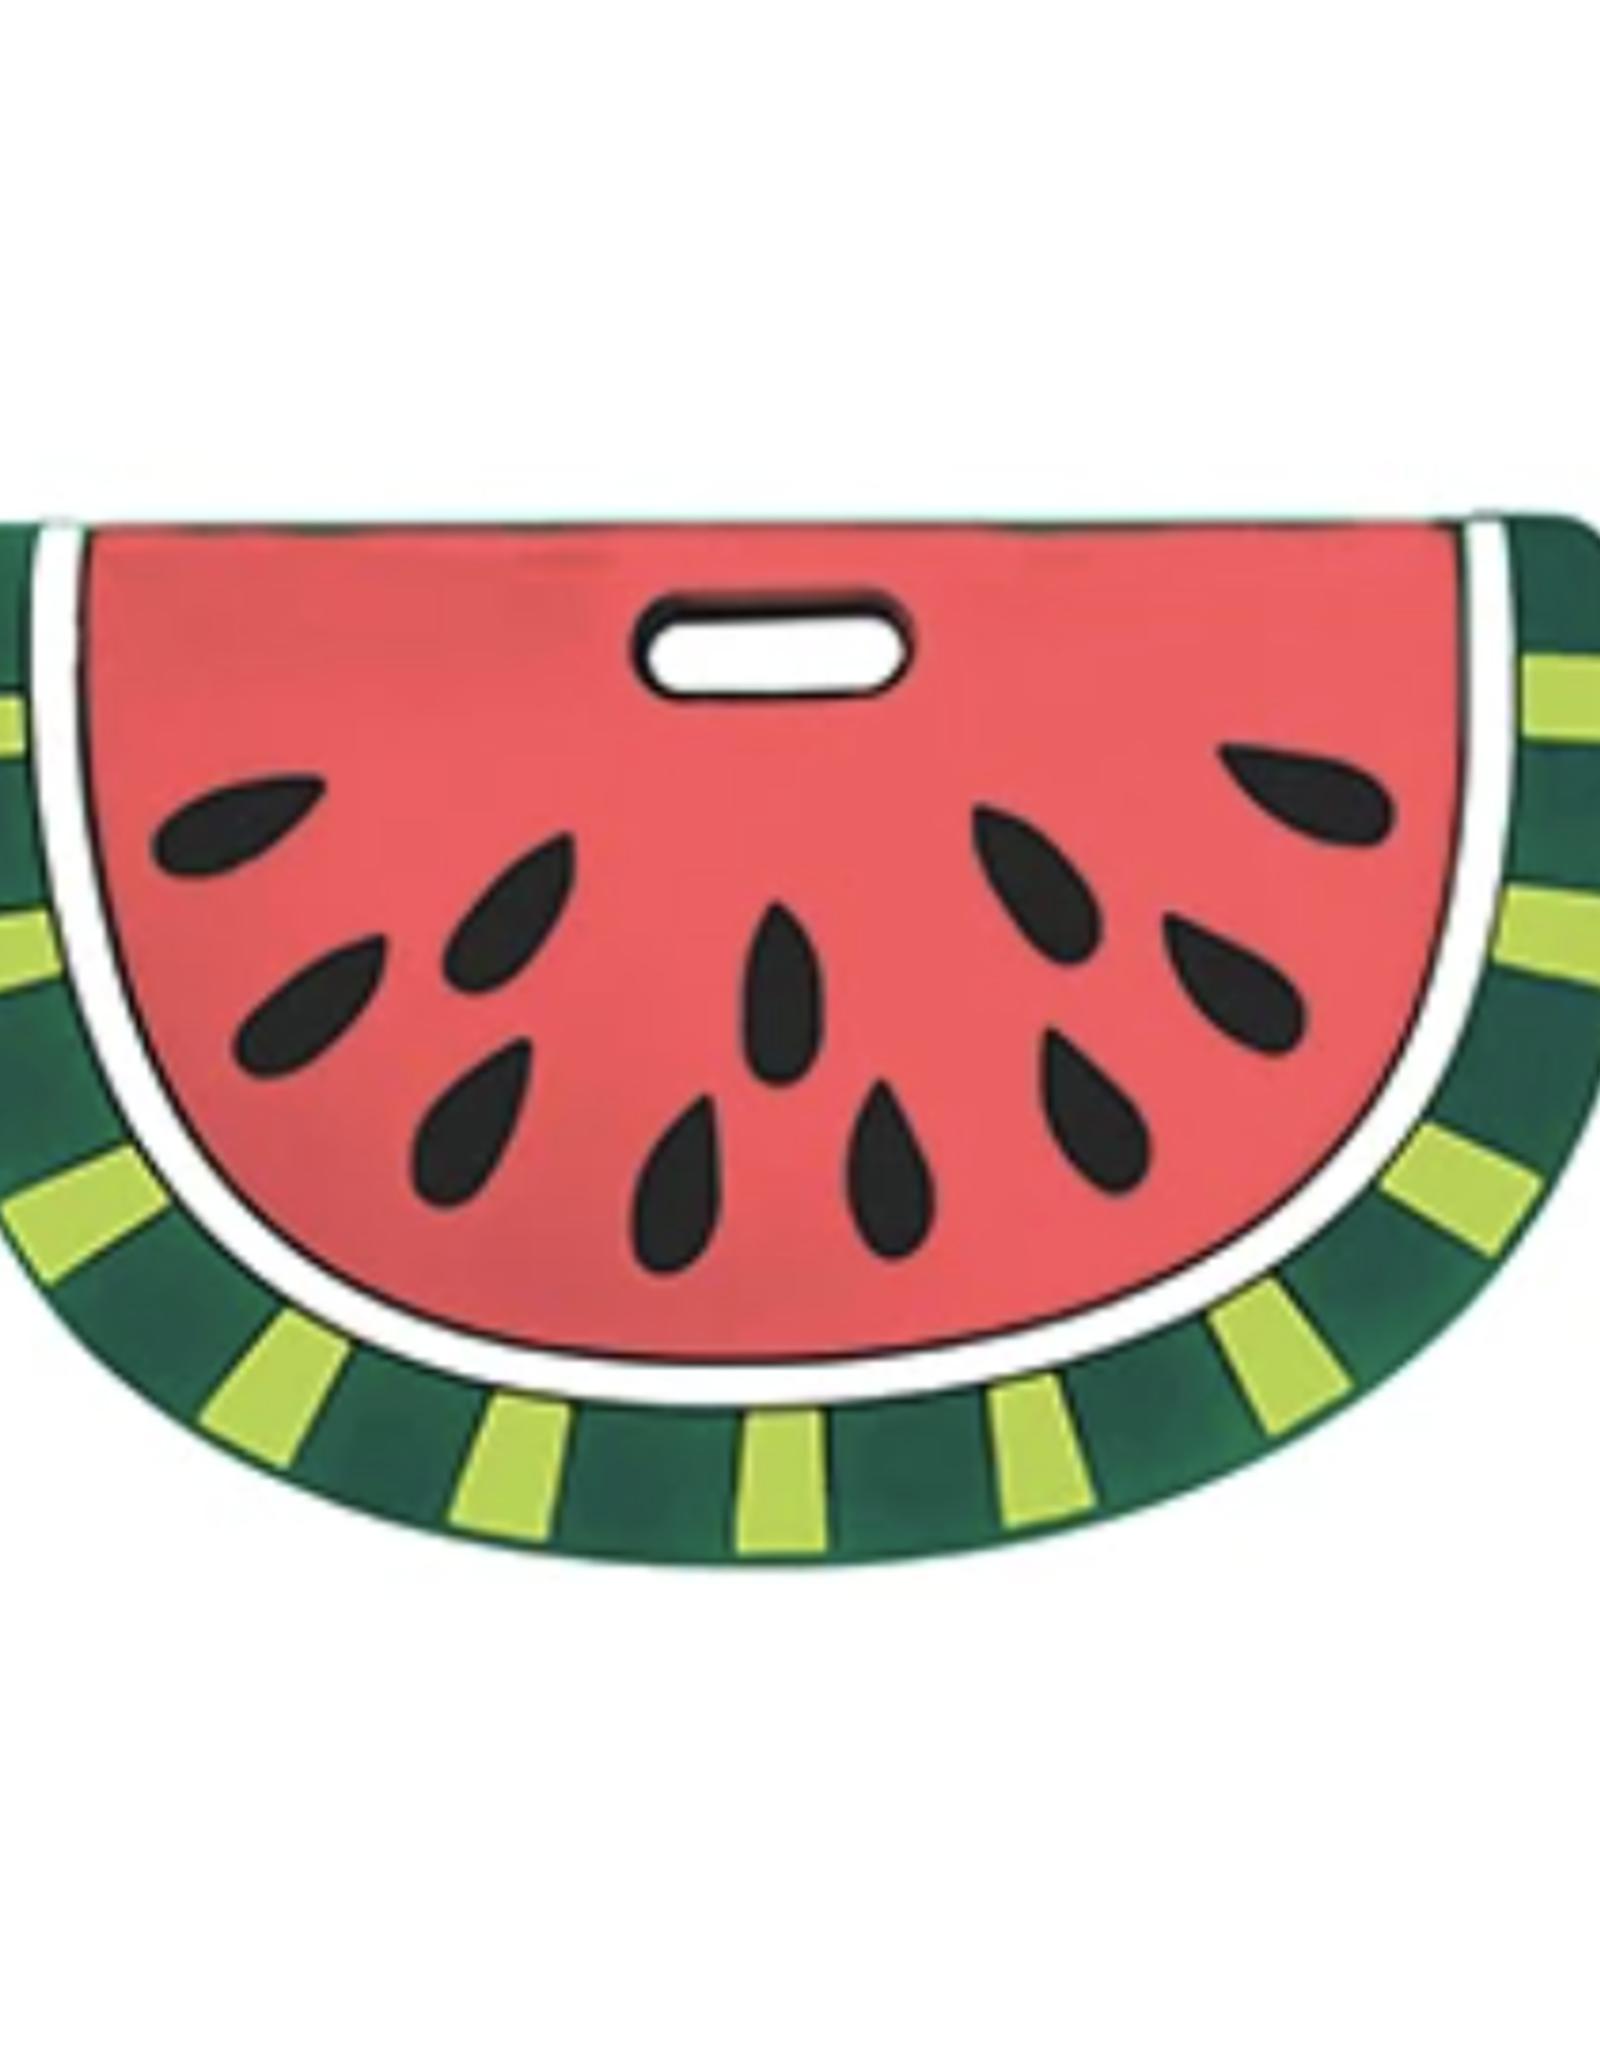 Silli Chews Watermelon Teether